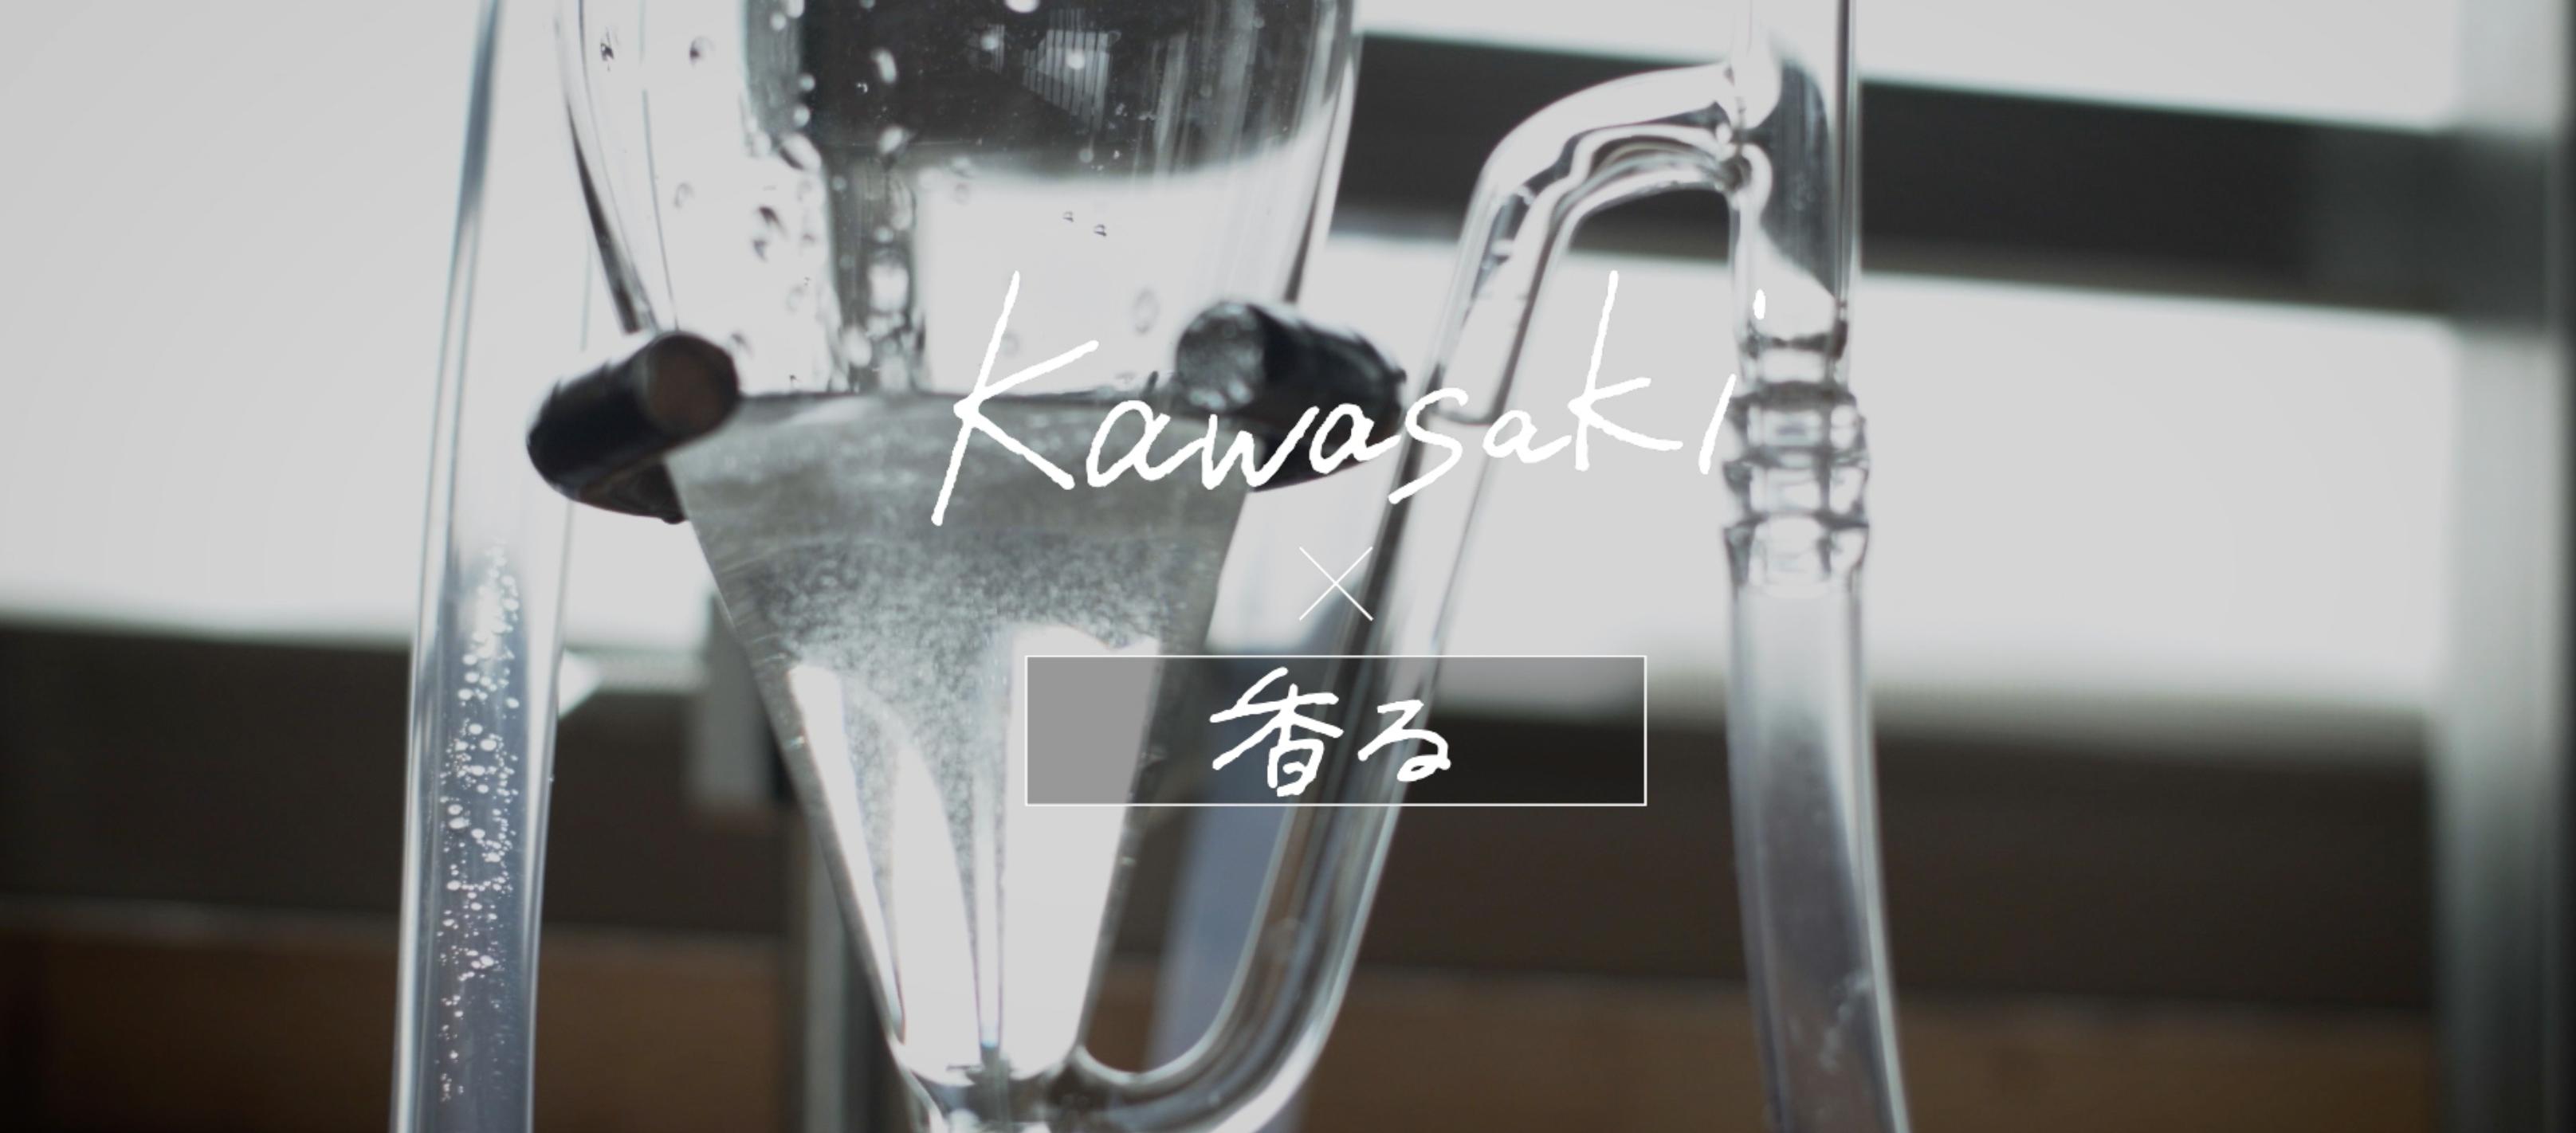 Kawasaki 5 sence 香る編